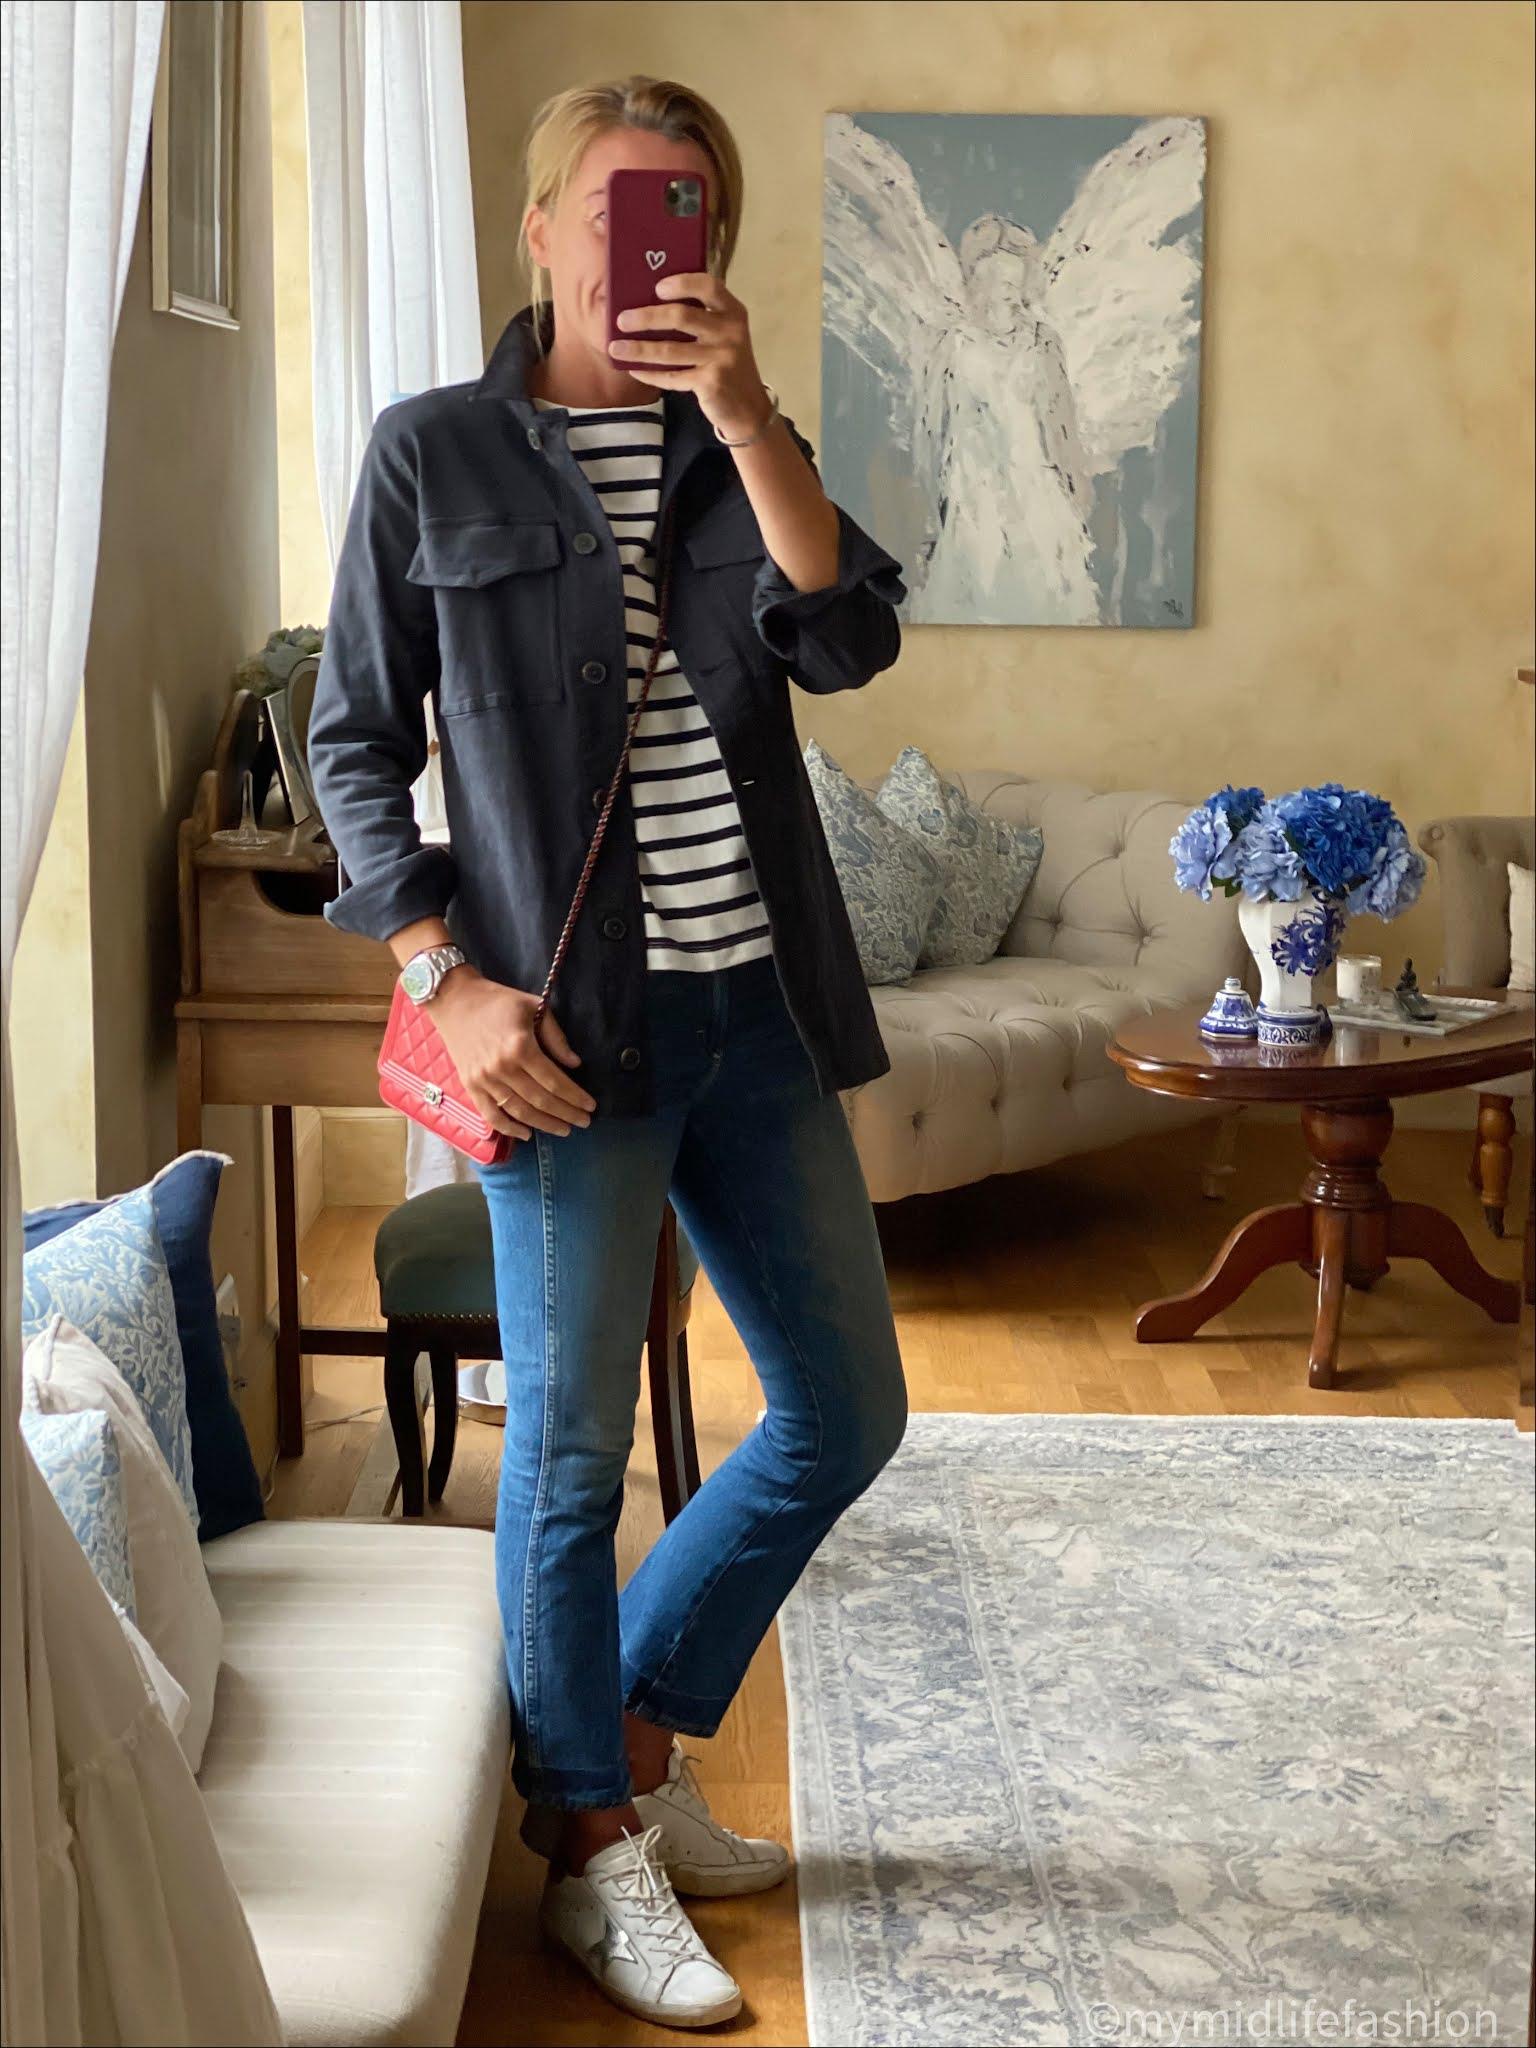 my midlife fashion, petit bateau women's Breton cotton top, j crew cropped kick flare jeans, golden goose superstar low top leather trainers, chanel wallet on chain, Baukjen alwen organic jacket